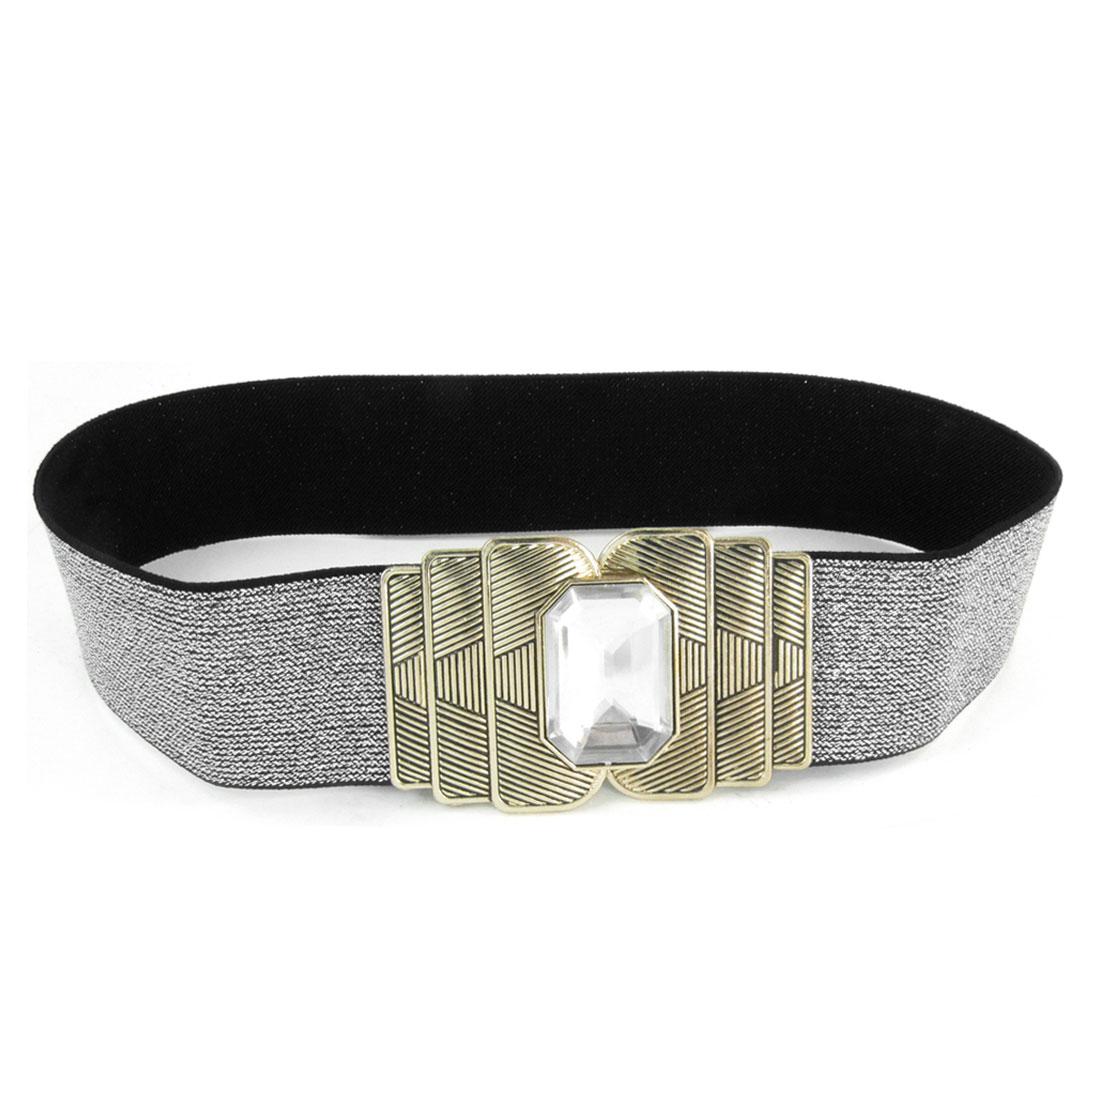 Lady Faceted Crystal Detail Metal Interlock Buckle Spandex Waistbelt Silver Tone